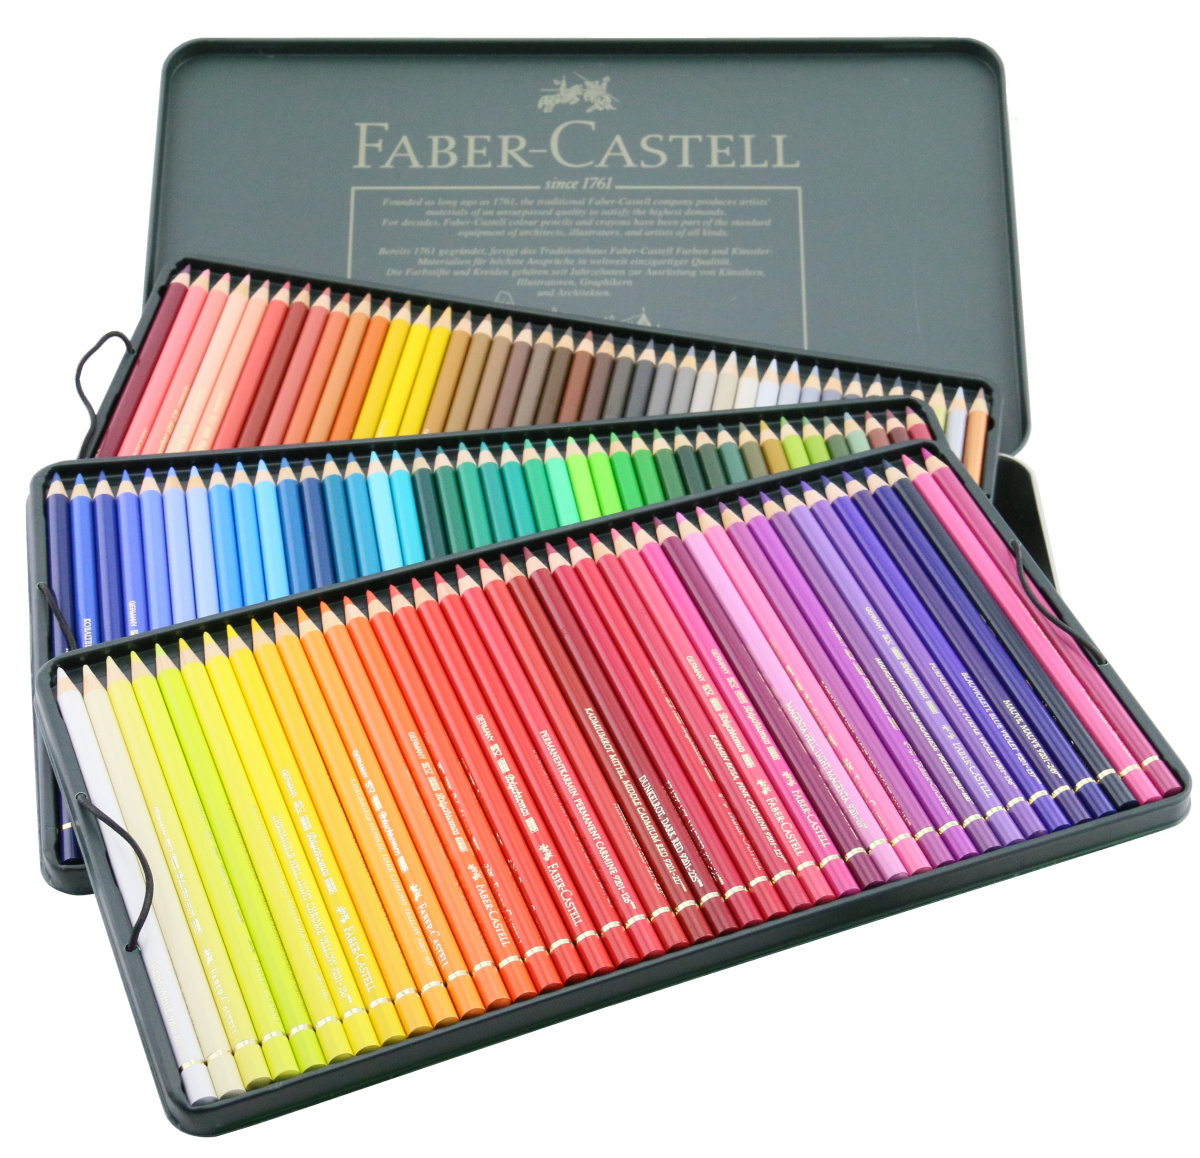 Faber Castell Polychromos 120 Pencil Metal Tin Set